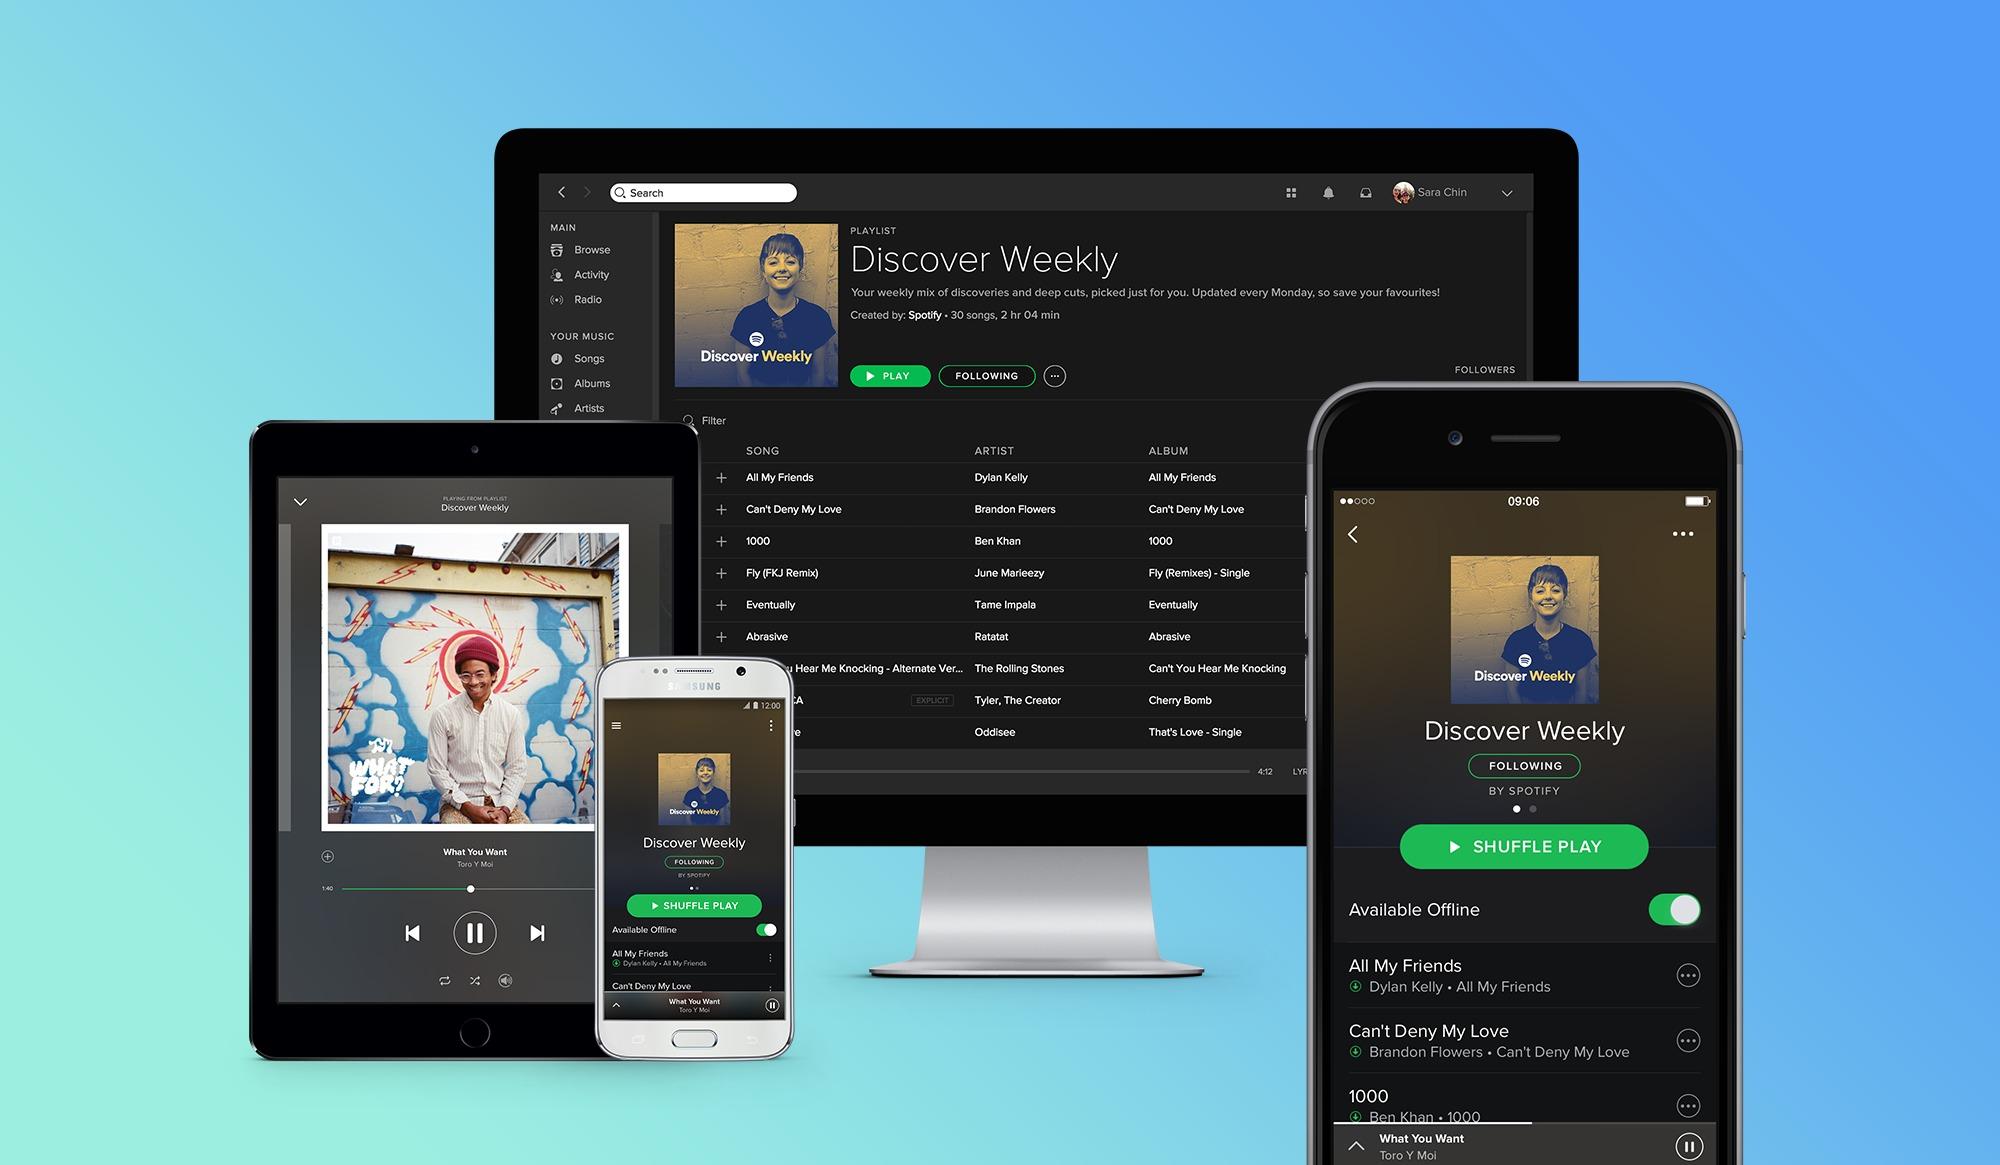 Spotify har tyvlyttere i nettet sitt.